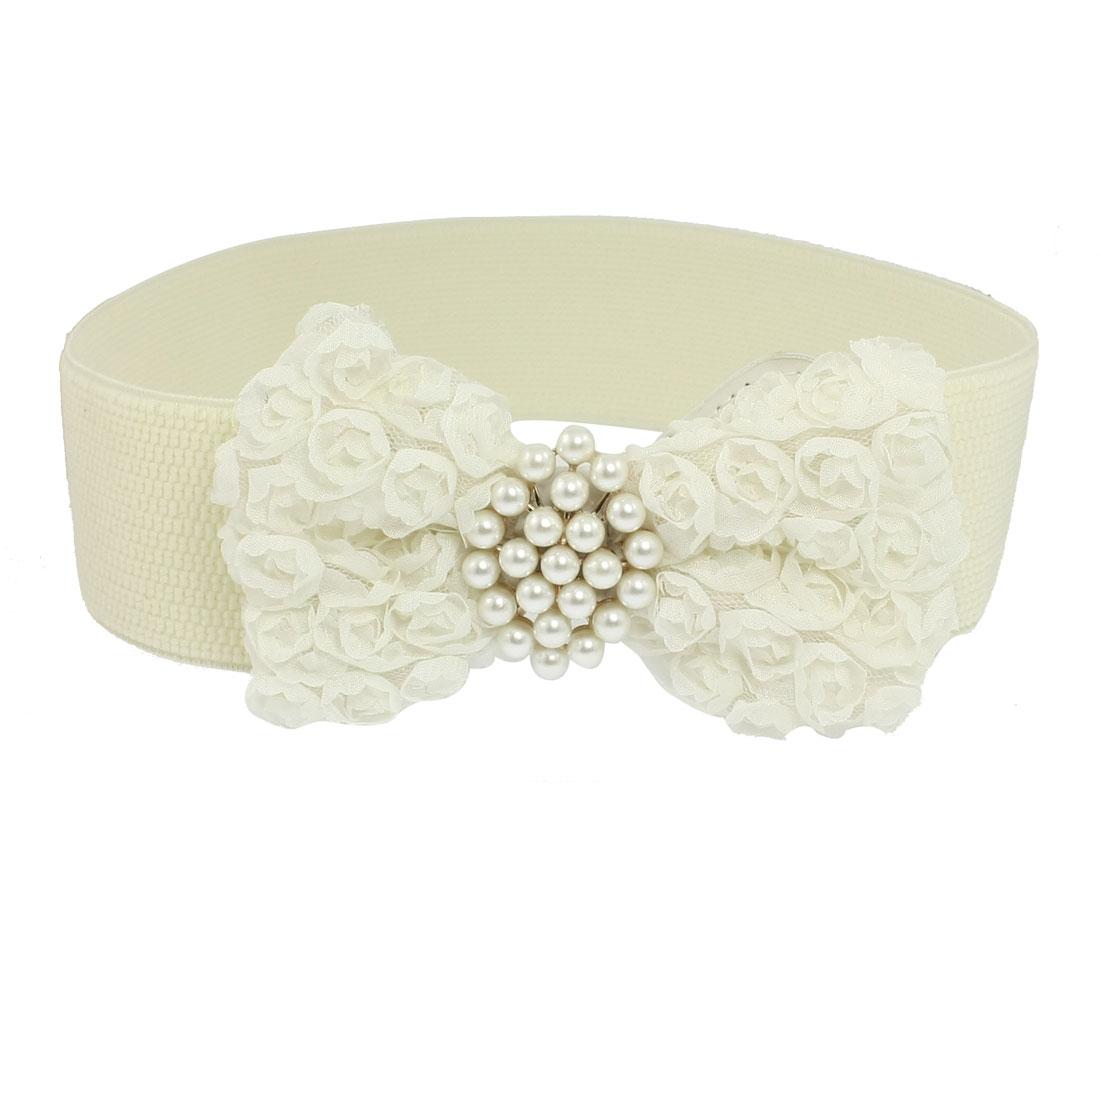 Women Floral Bowknot Beads Decor Beige Stretch Cinch Belt